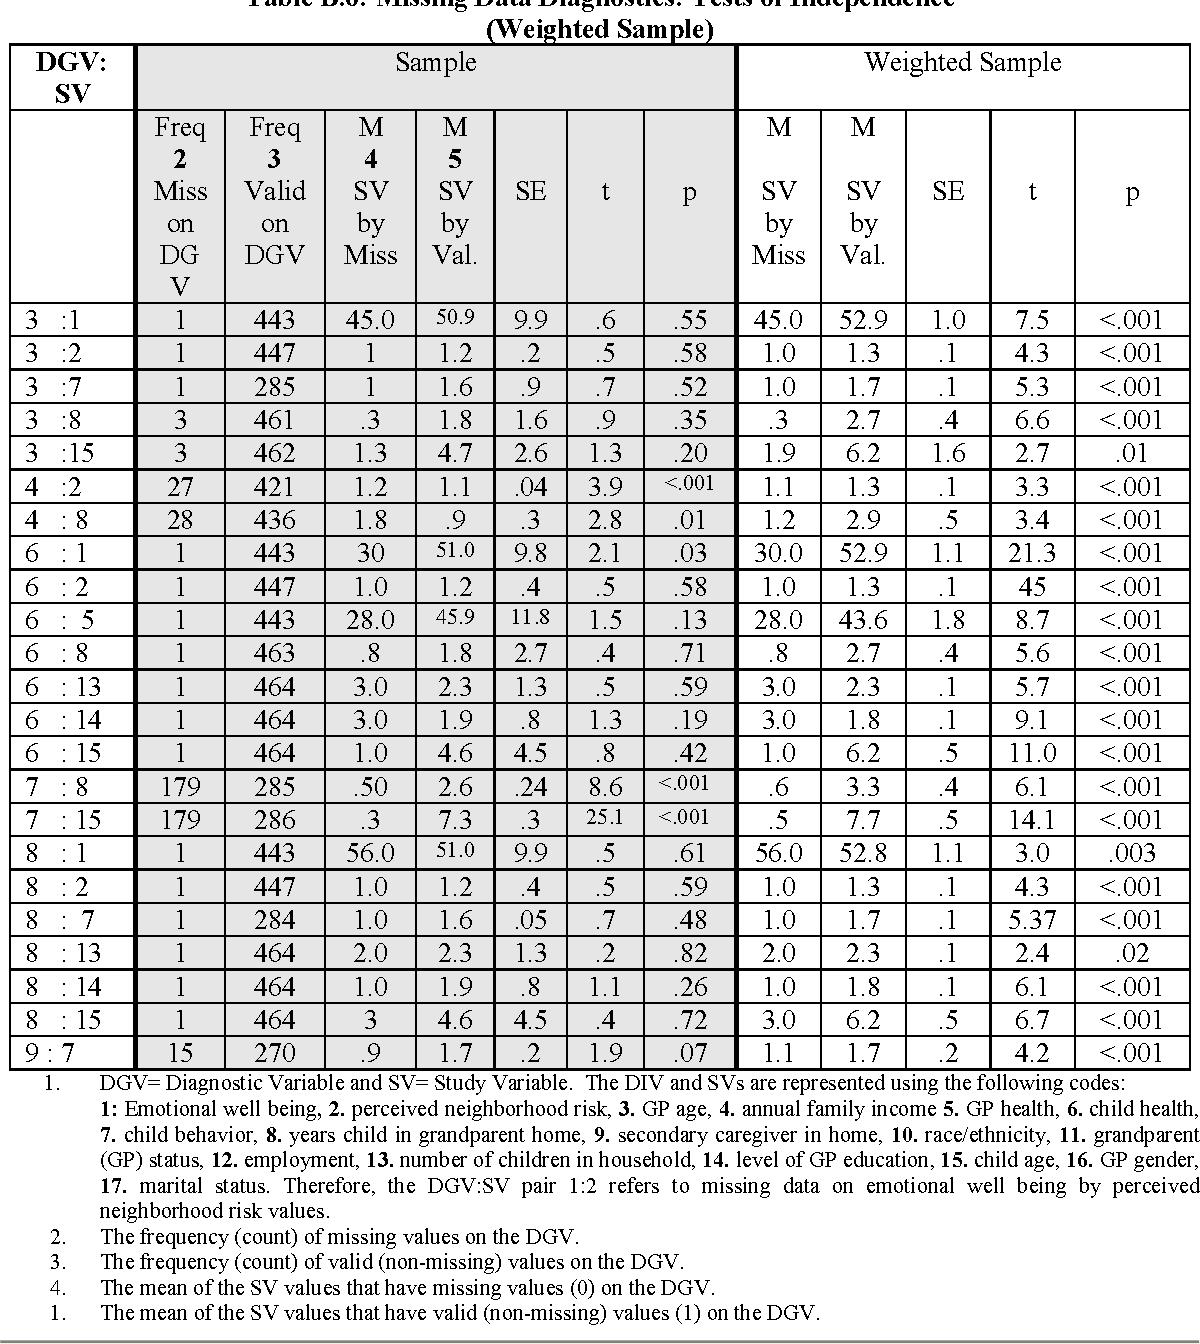 table B.6